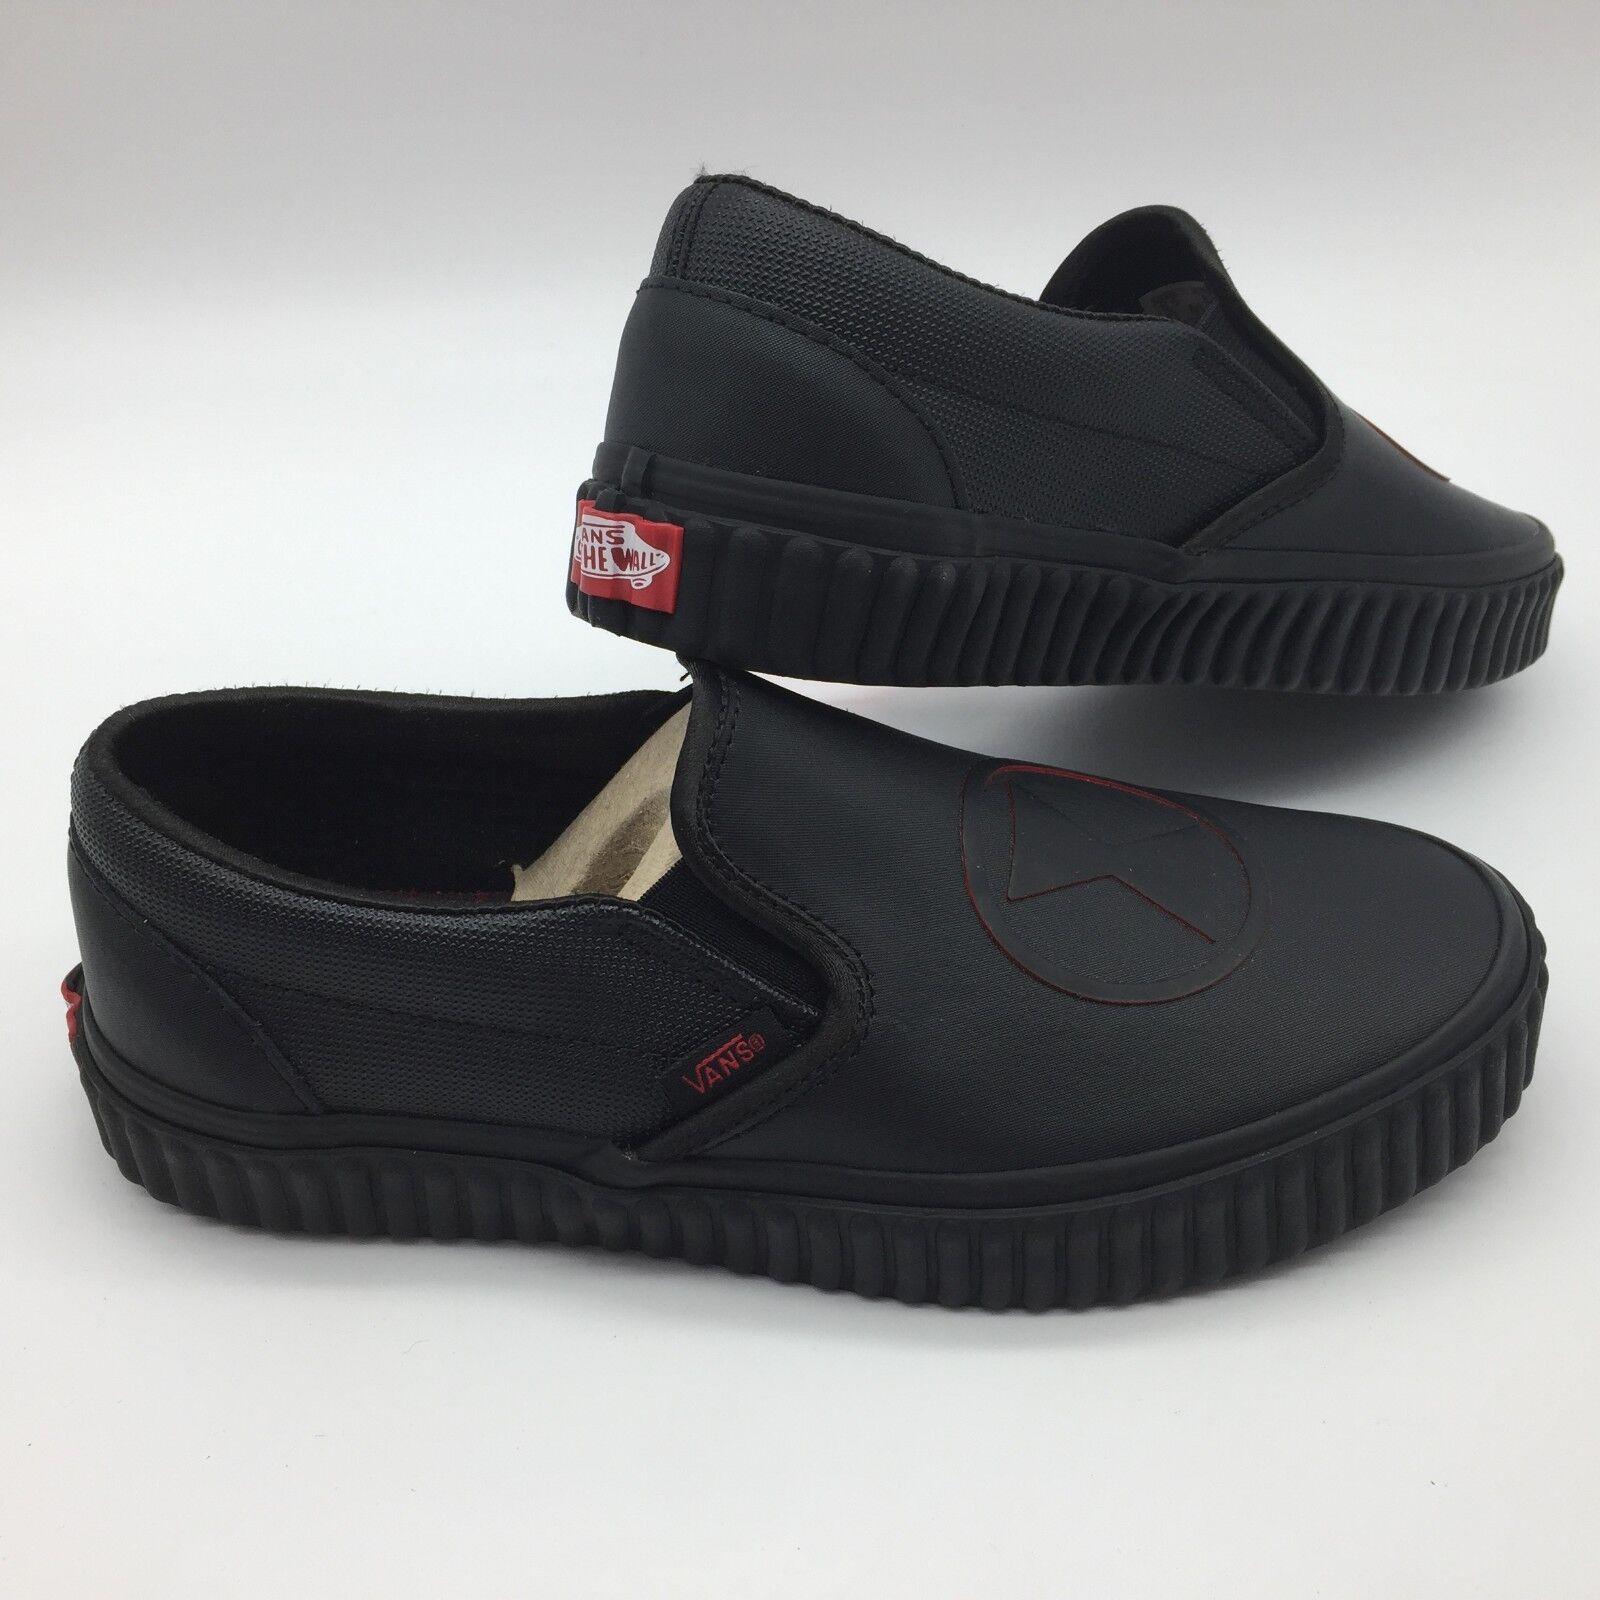 Vans Men Women's shoes  Classic Slip-On  -- (Marvel) Black Widow Black